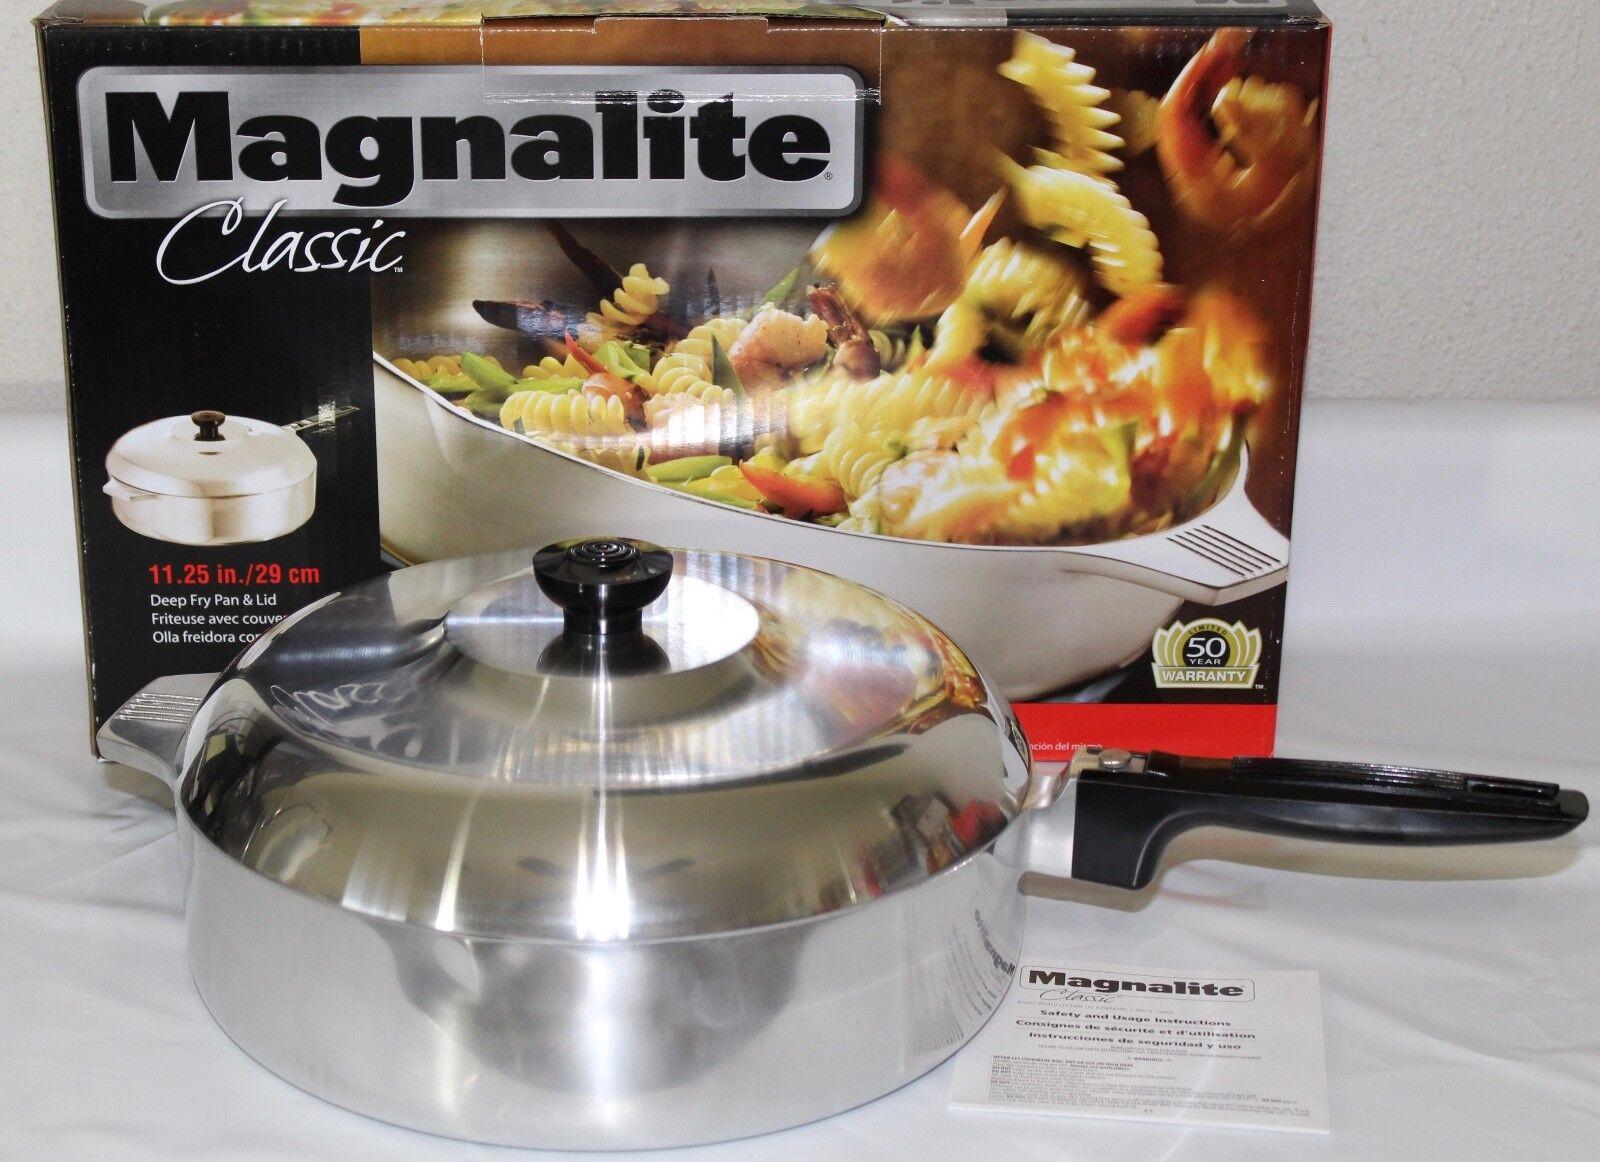 Magnalite Classic 11.25  Deep Fry Pan & Lid, 1040818